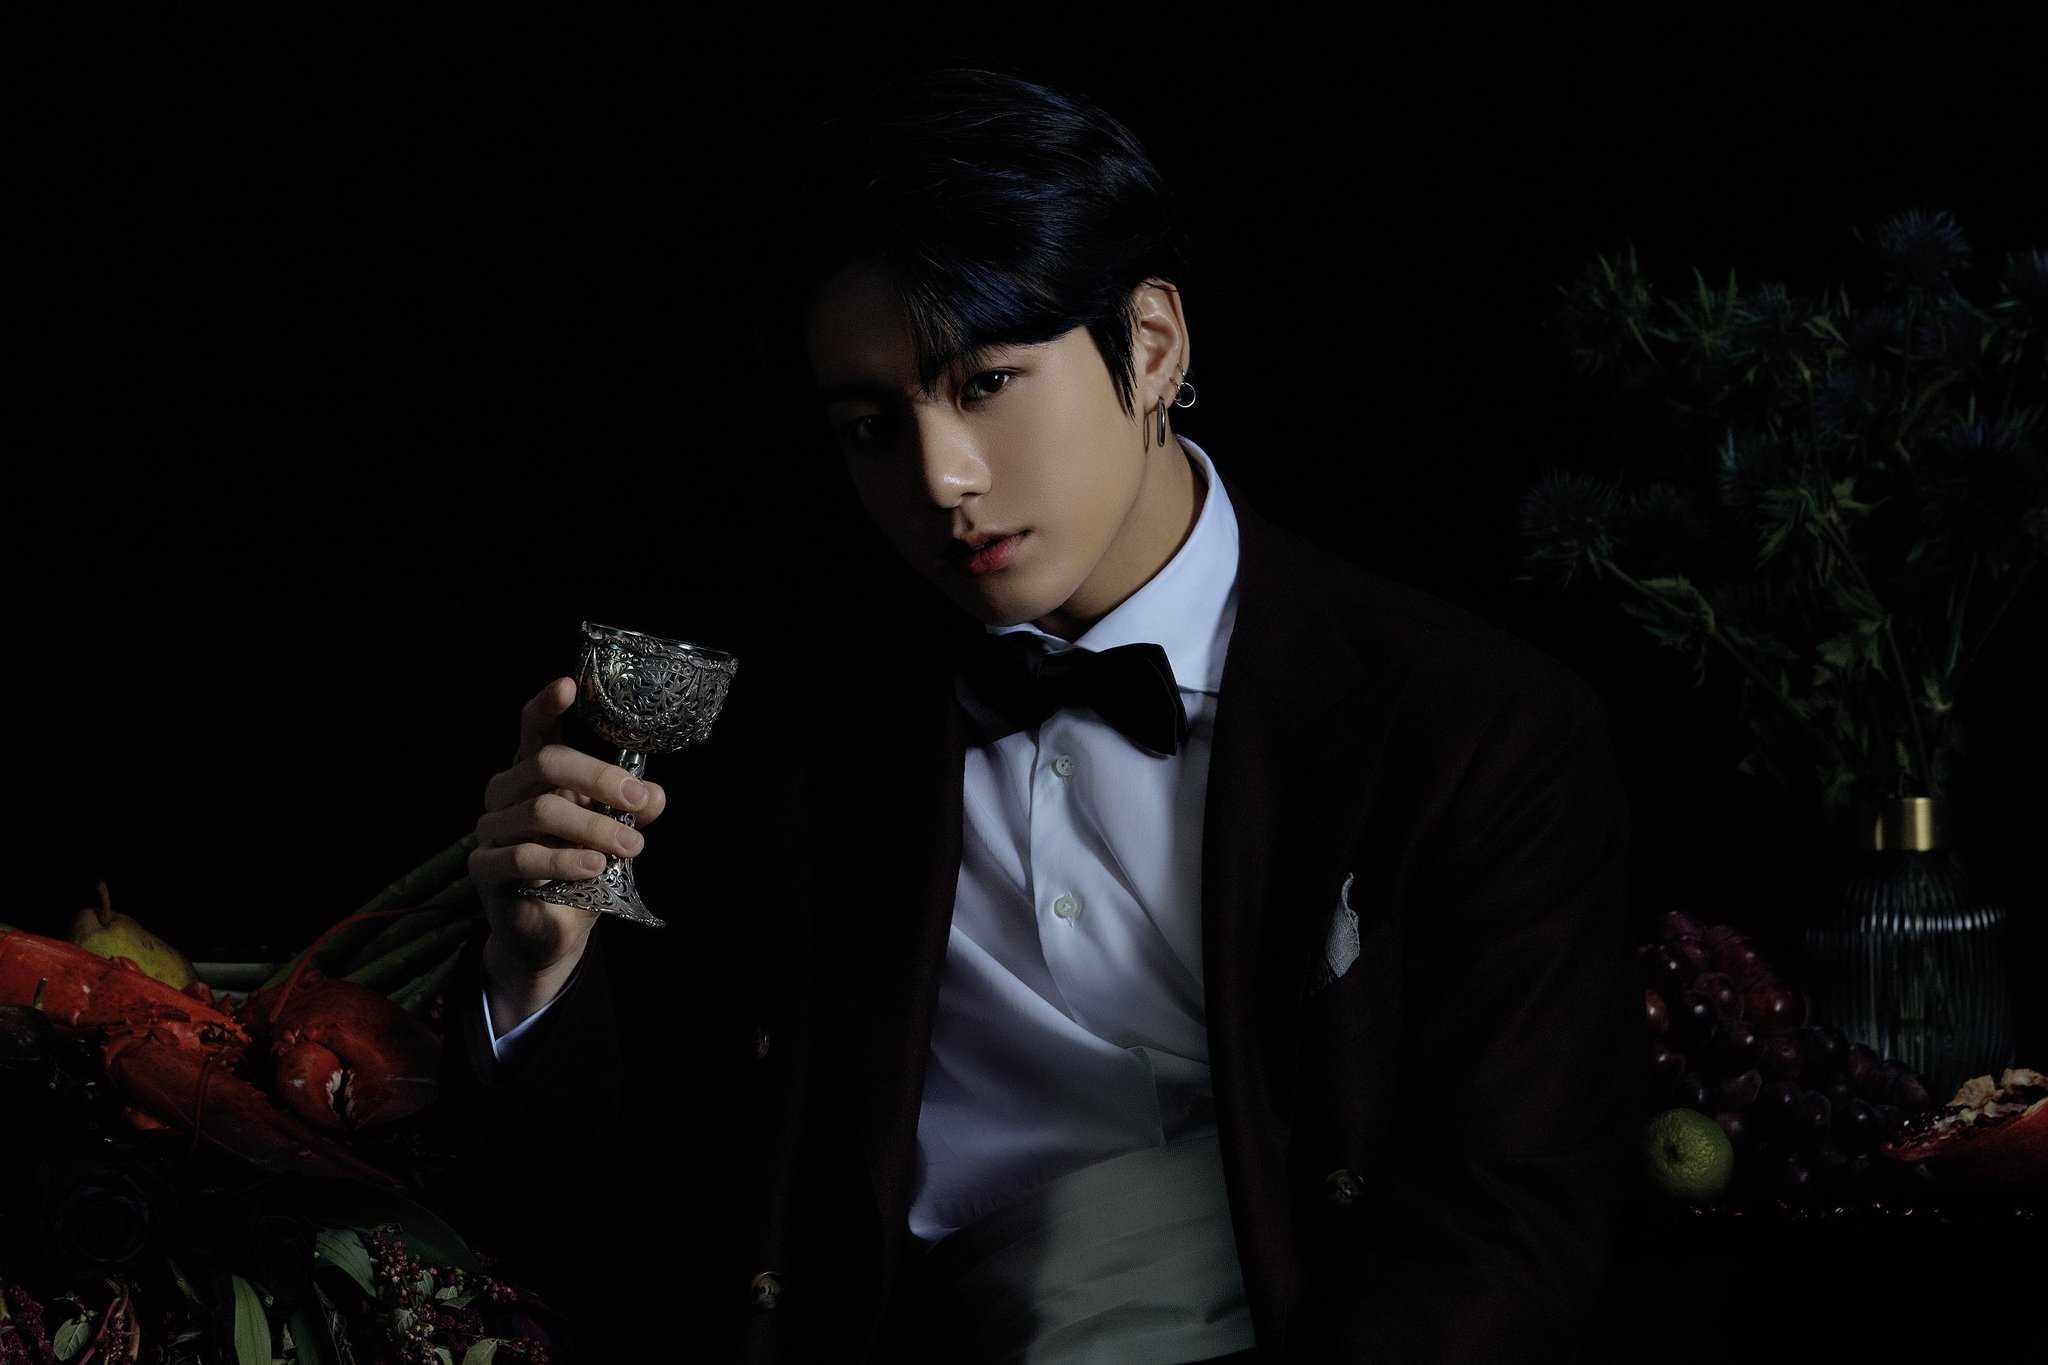 2020 SEASON'S GREETINGS | Bts jungkook, Bts season ...  |2020 Bts Jung Kook